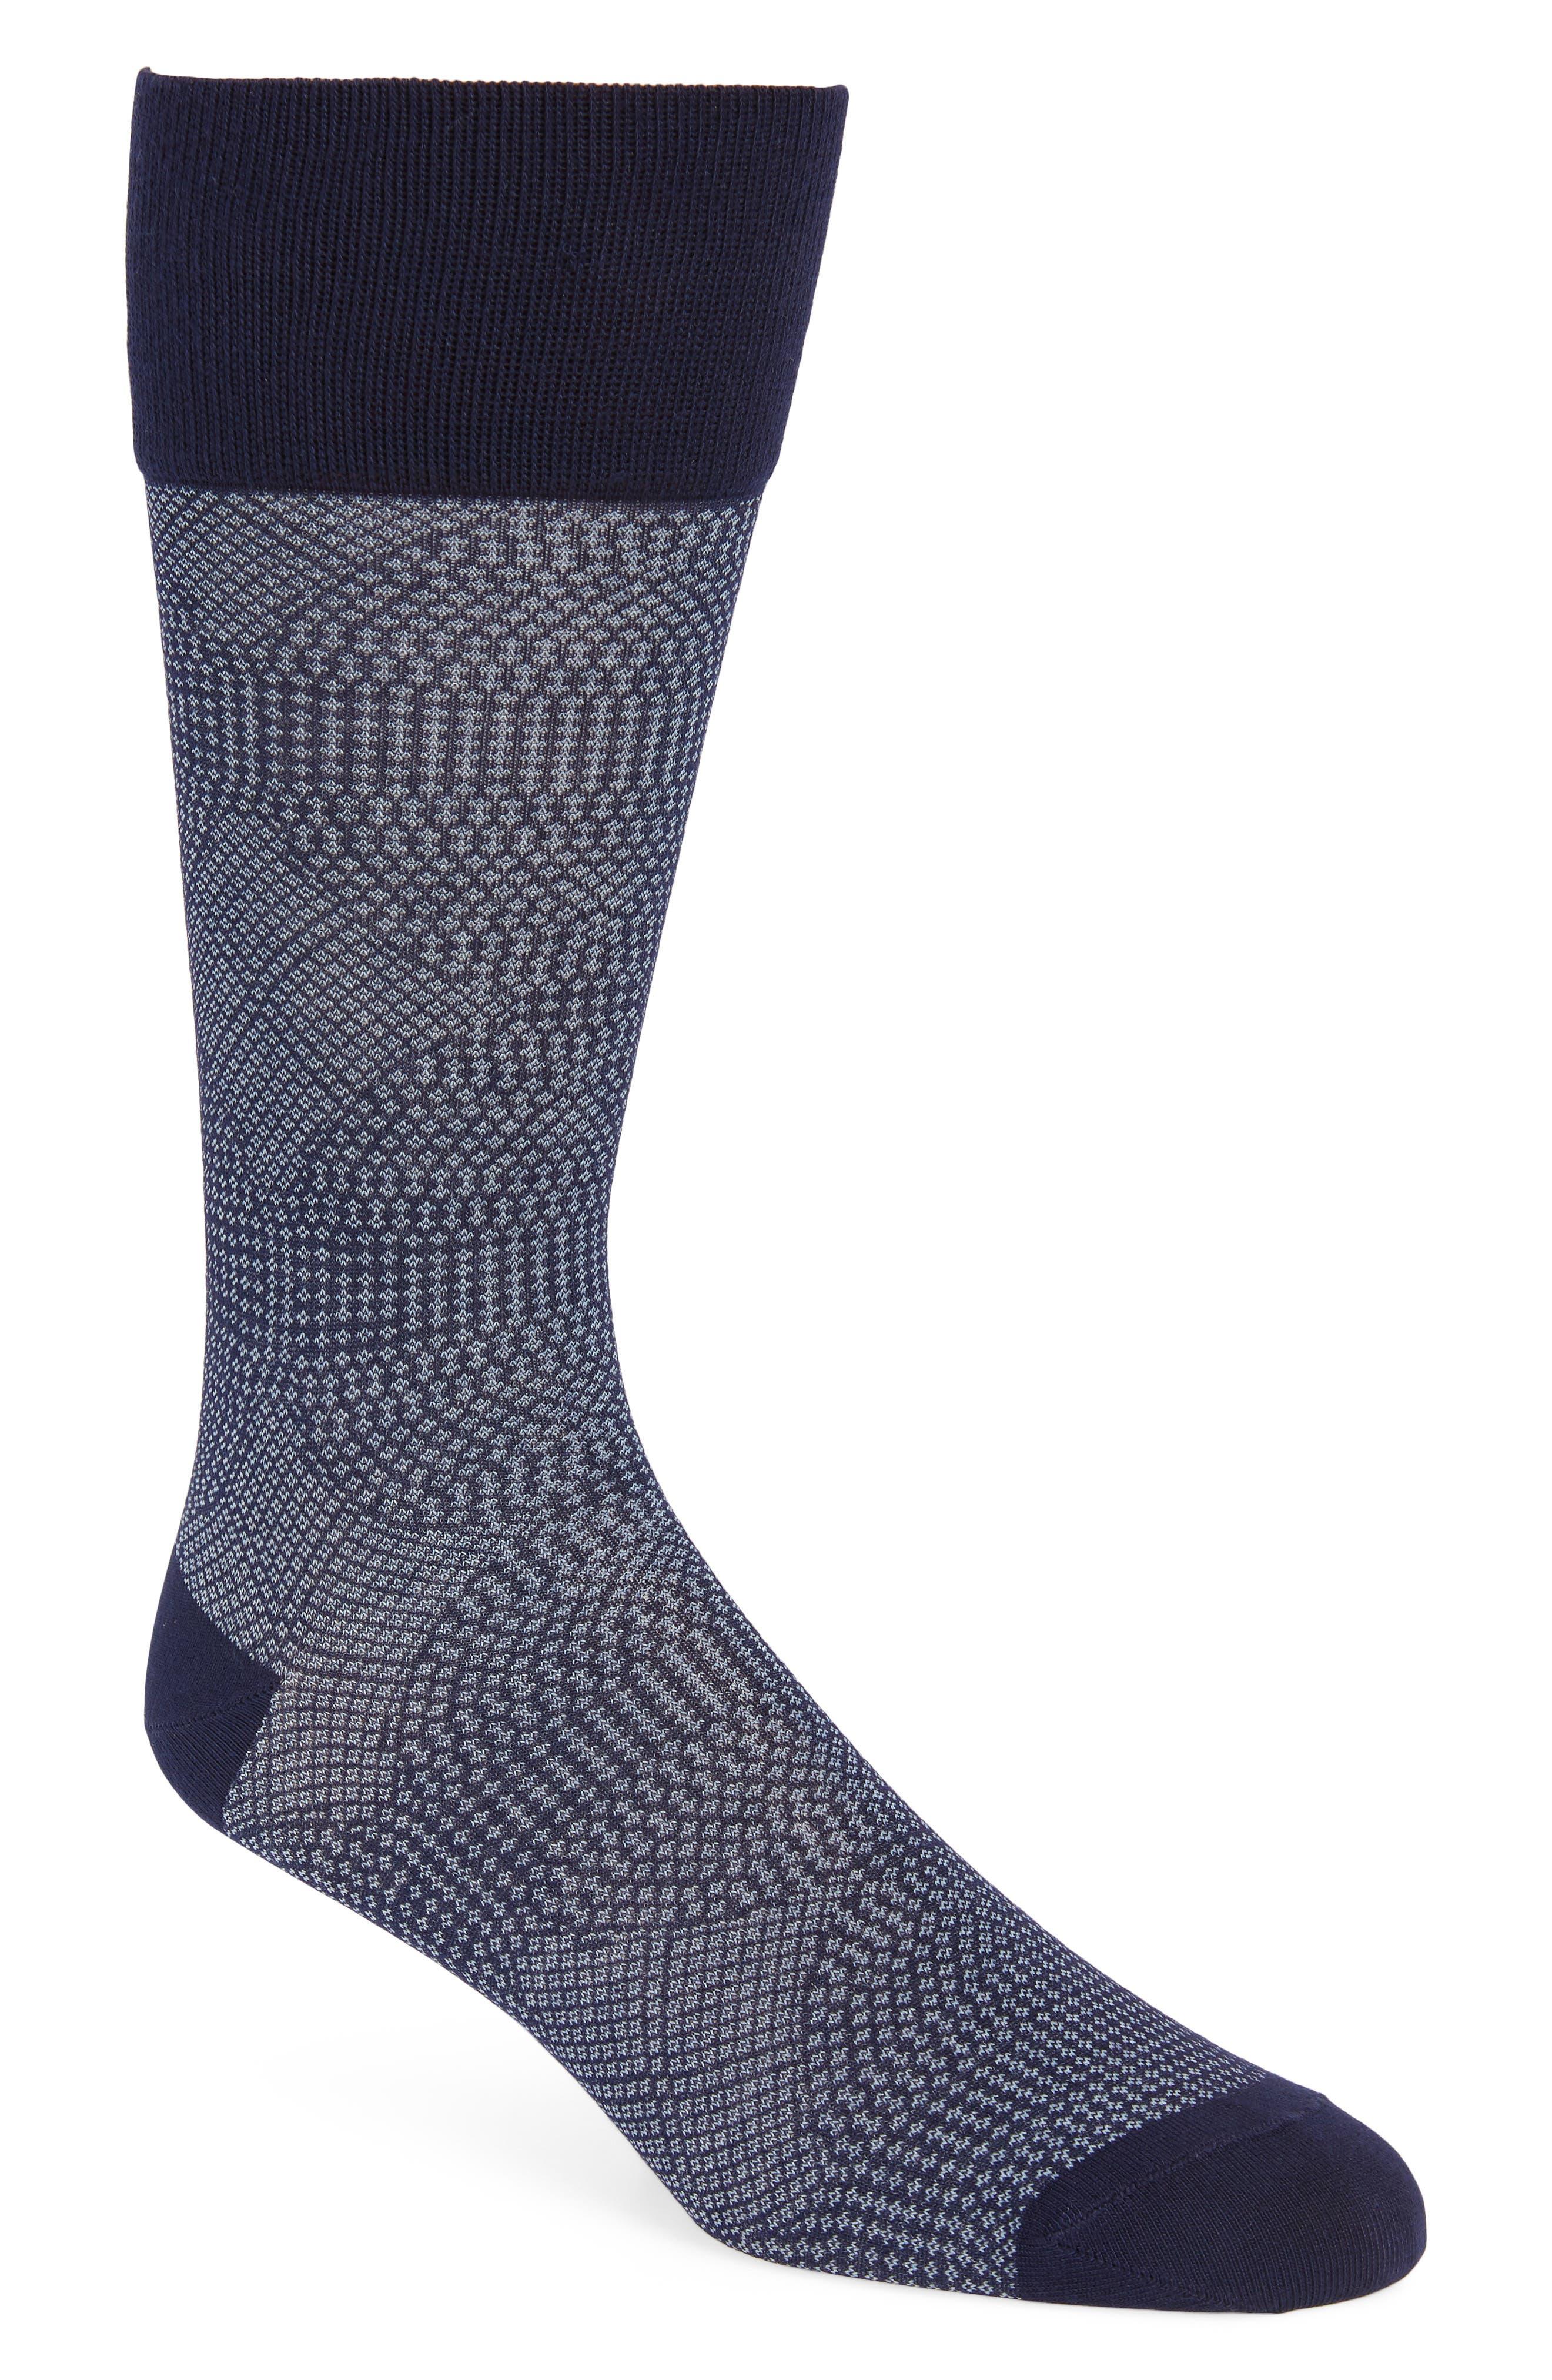 Quatrefoil Solid Socks,                         Main,                         color, Navy/ White